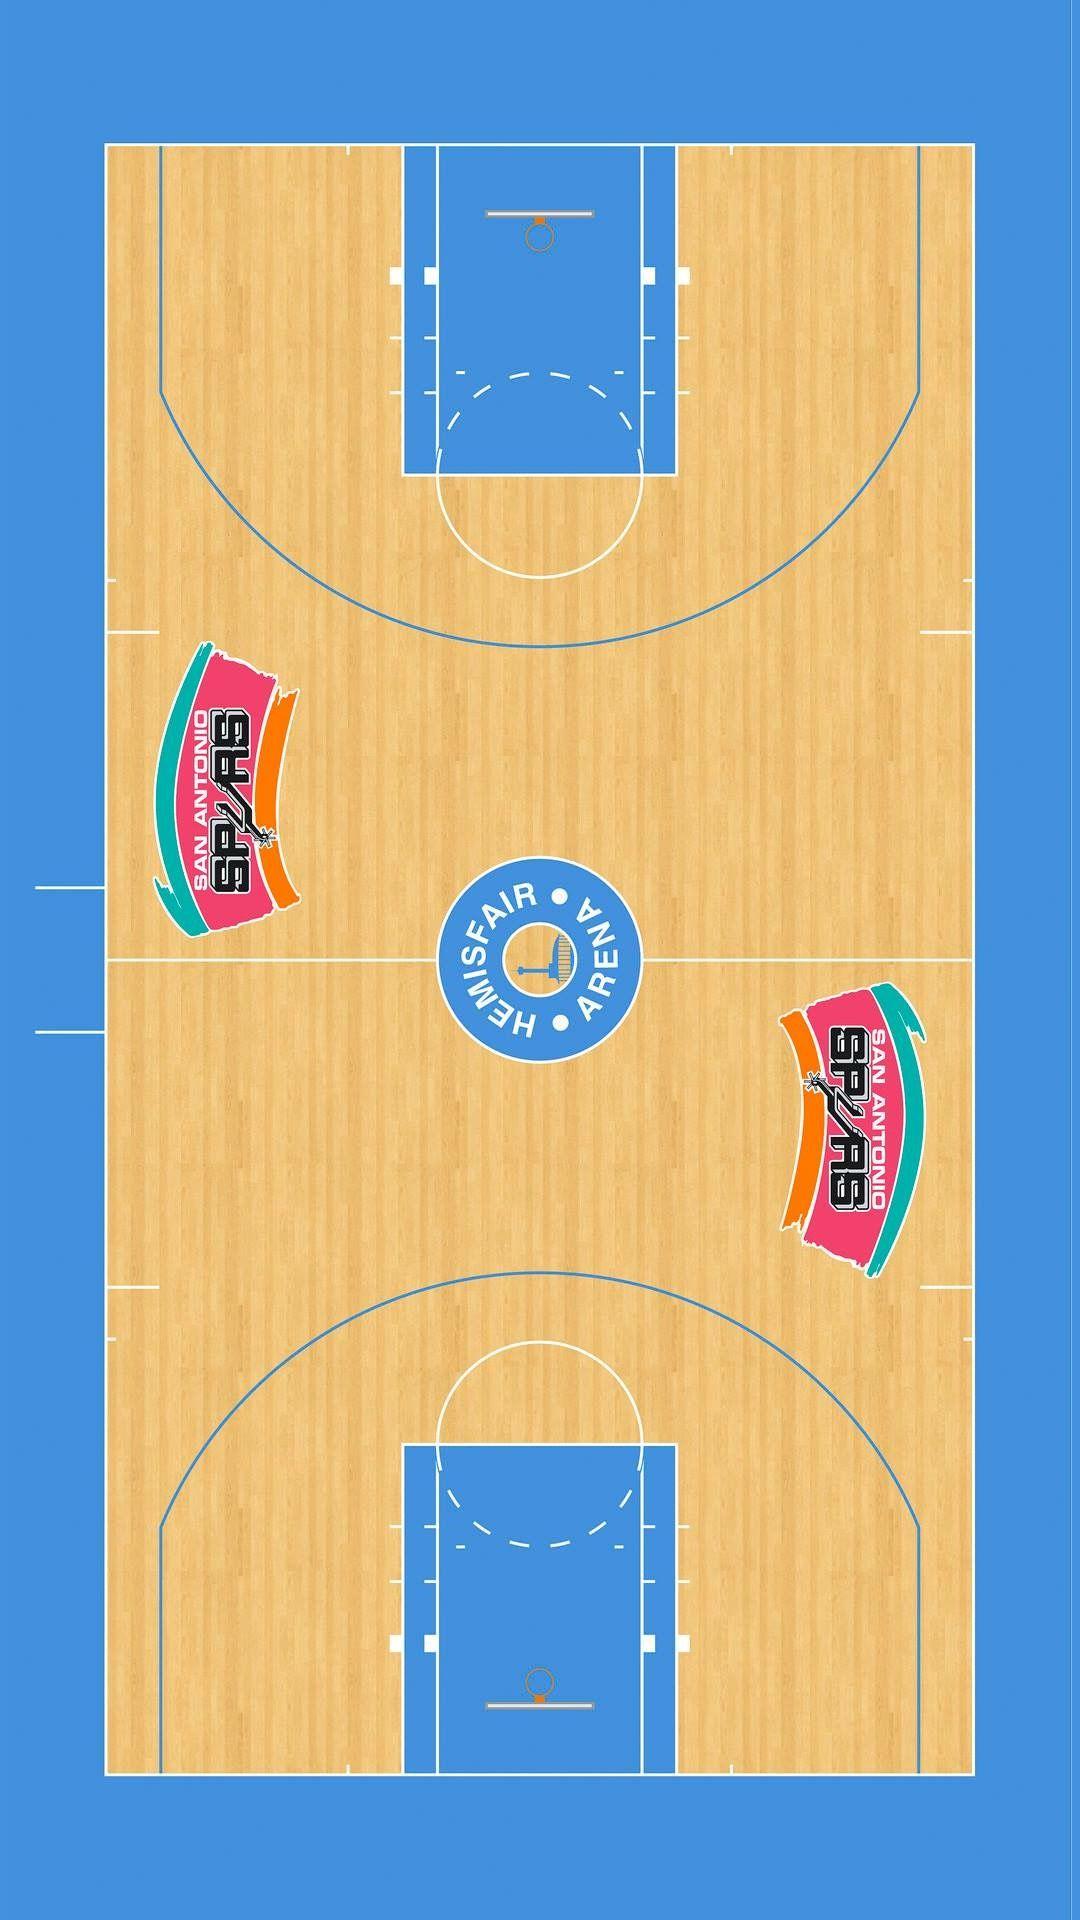 Hemisfair Court Nba Basketball Nba Nba Teams